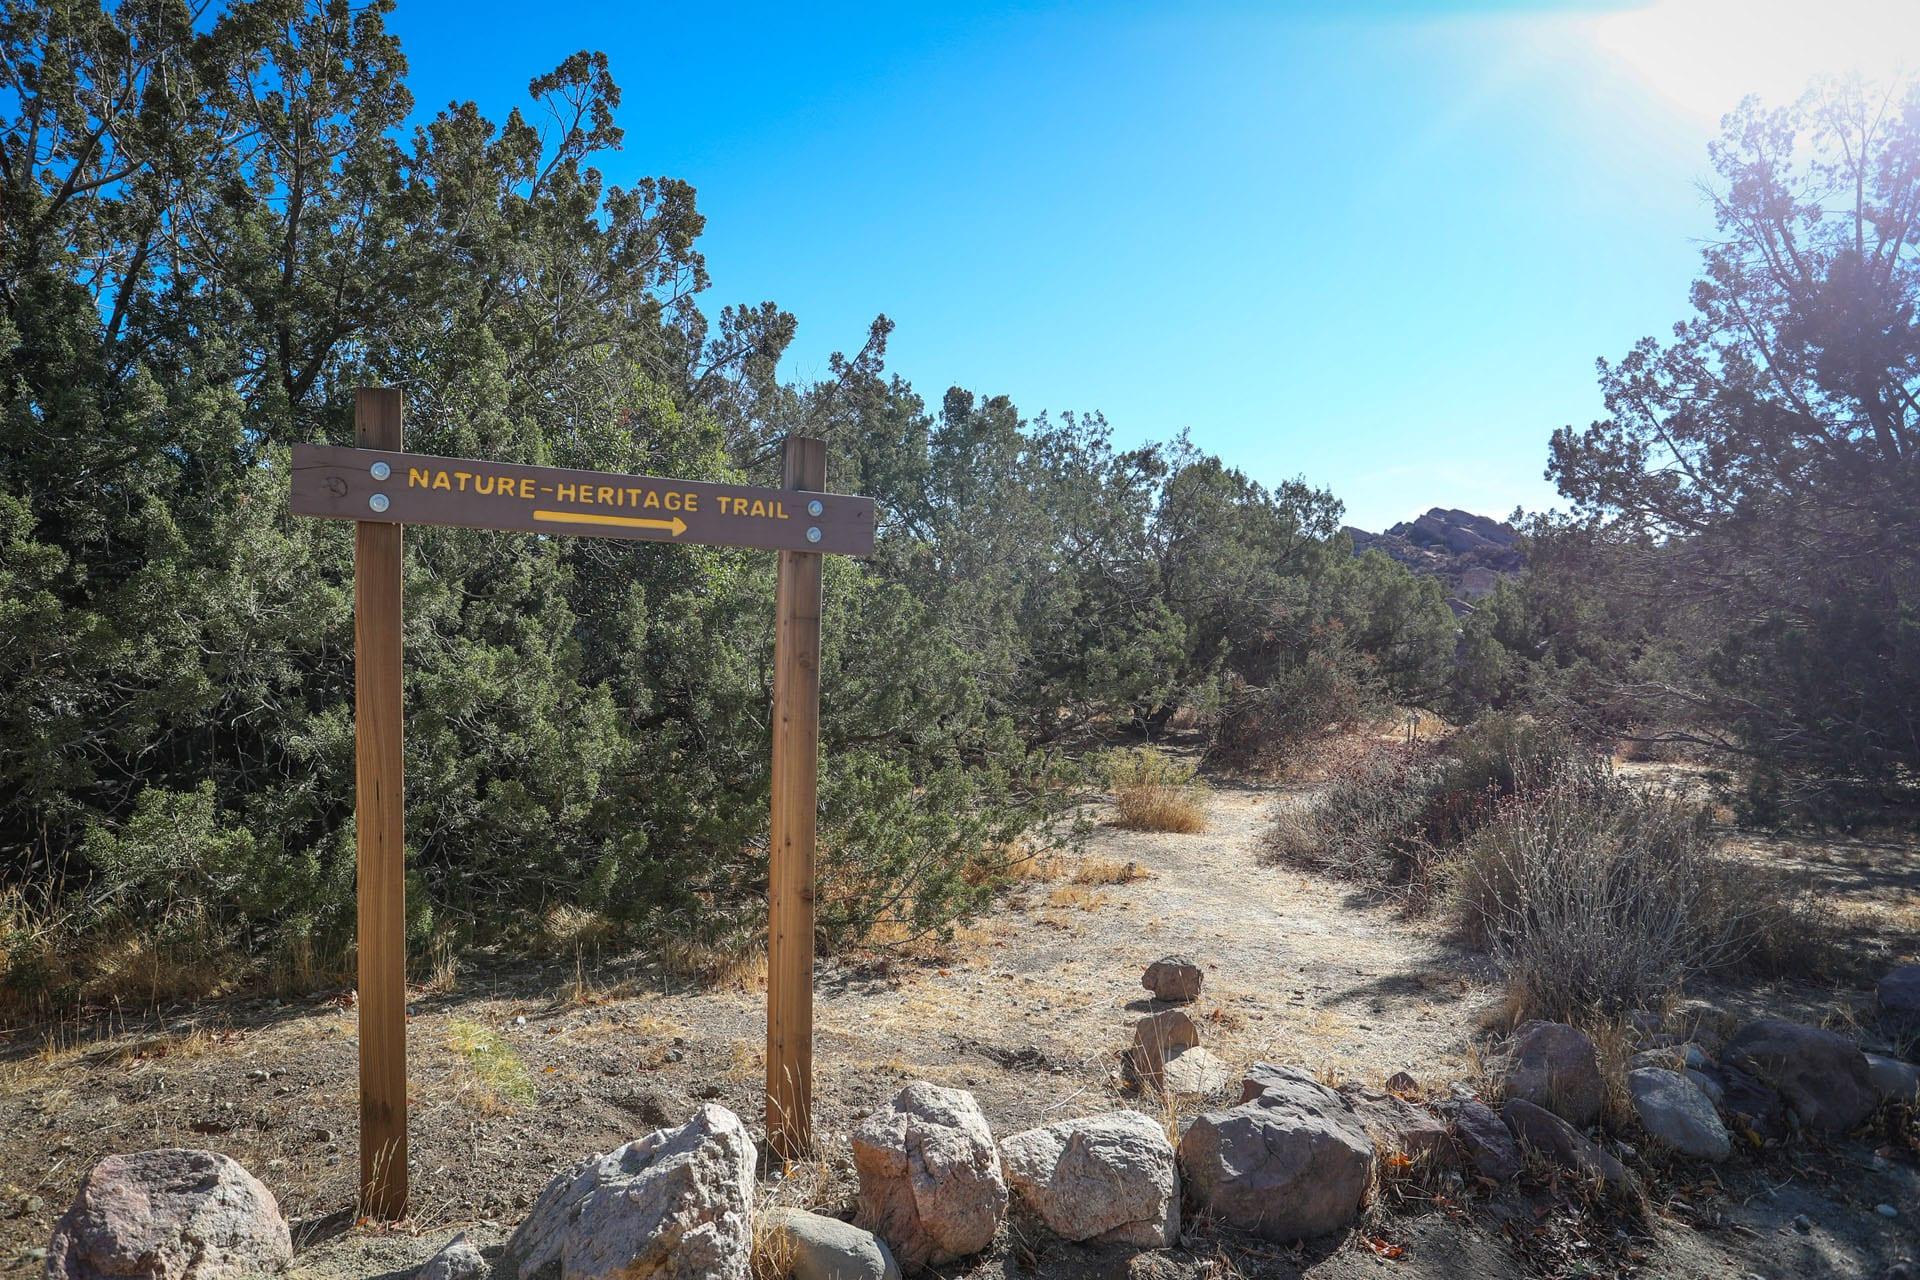 Nature Heritage Trail trailhead sign